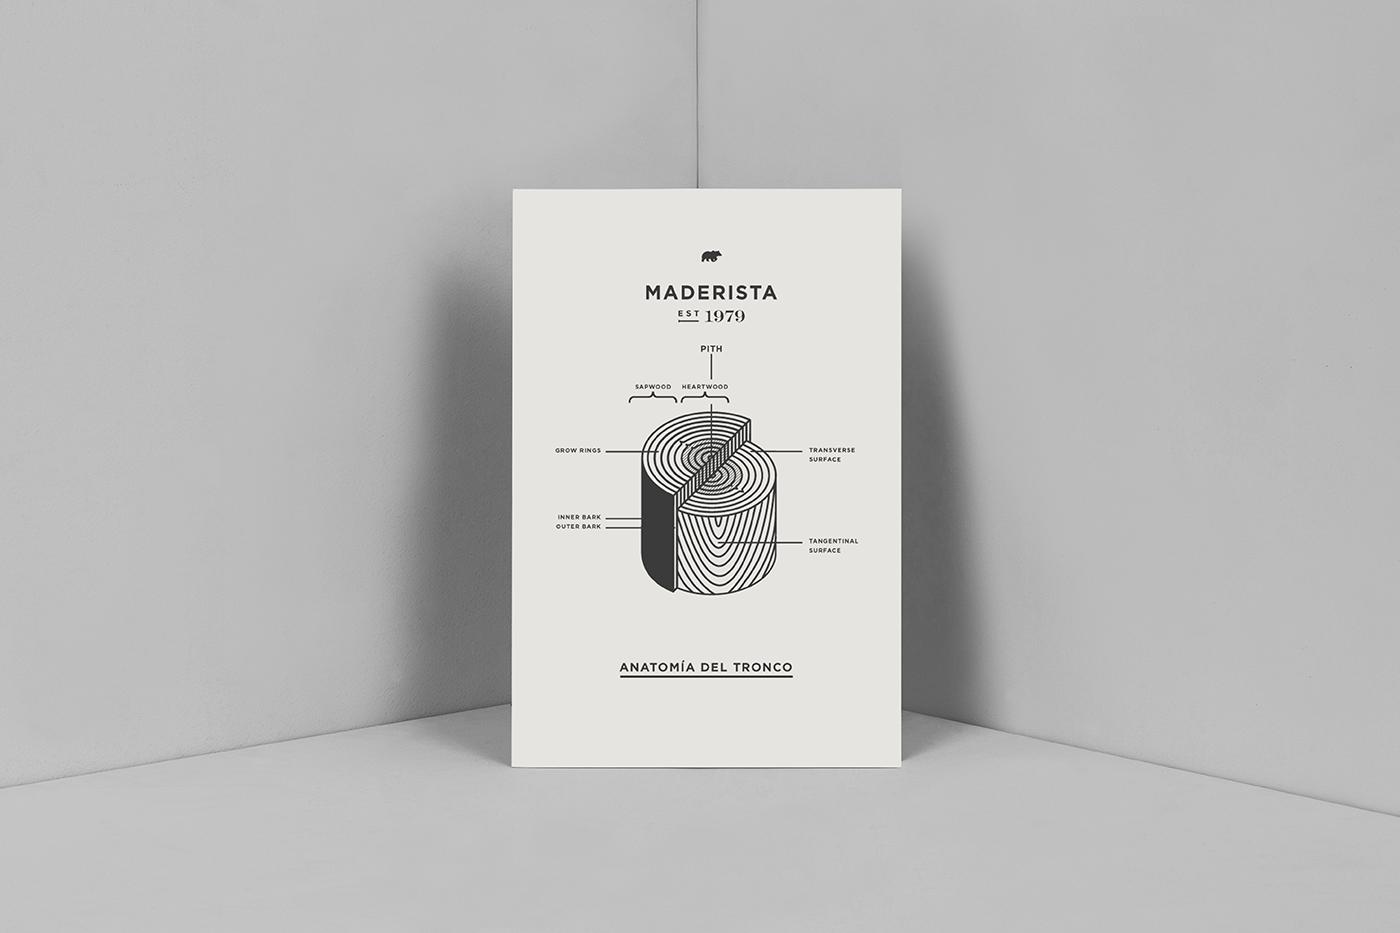 Poster design monochrome - Poster Design We Love Posters By Anagrama Studio